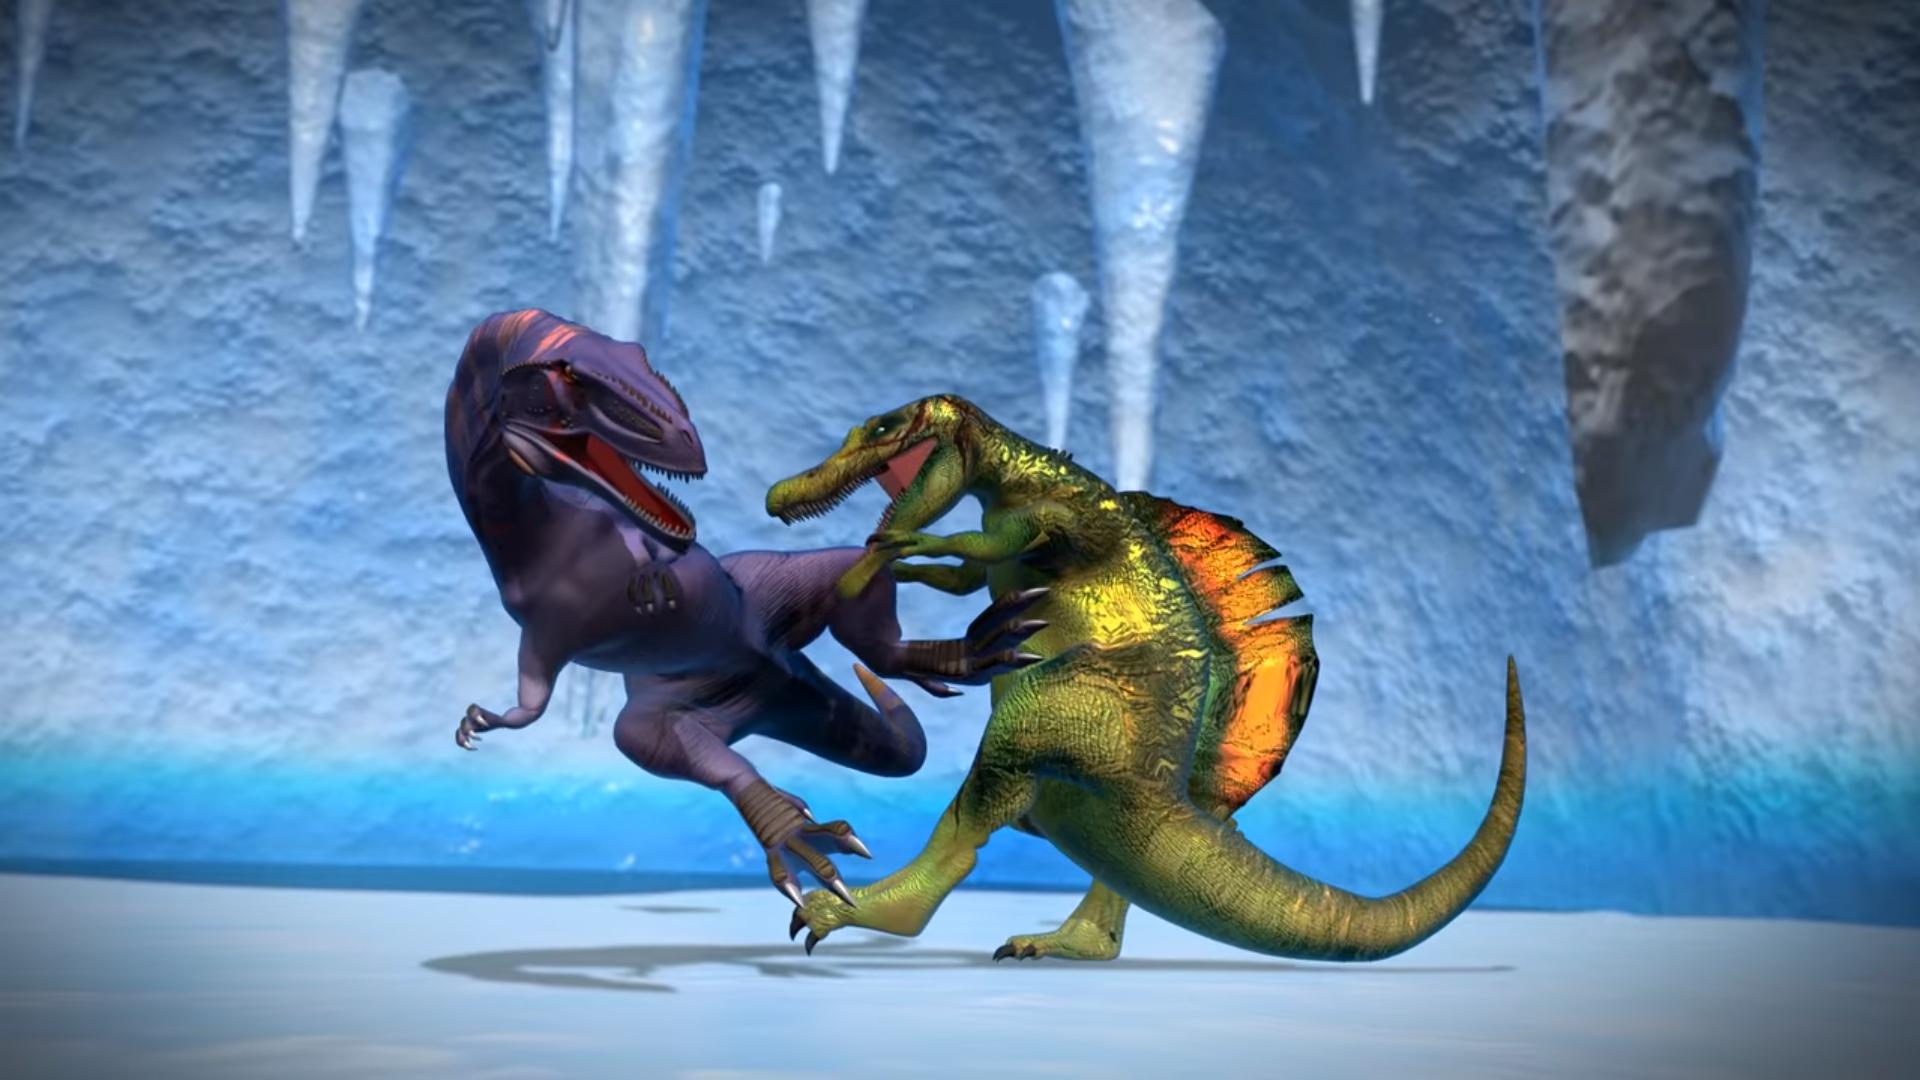 Giganotosaurus vs Spinosaurus | Dinosaurs Battle World ...Giganotosaurus Vs Spinosaurus